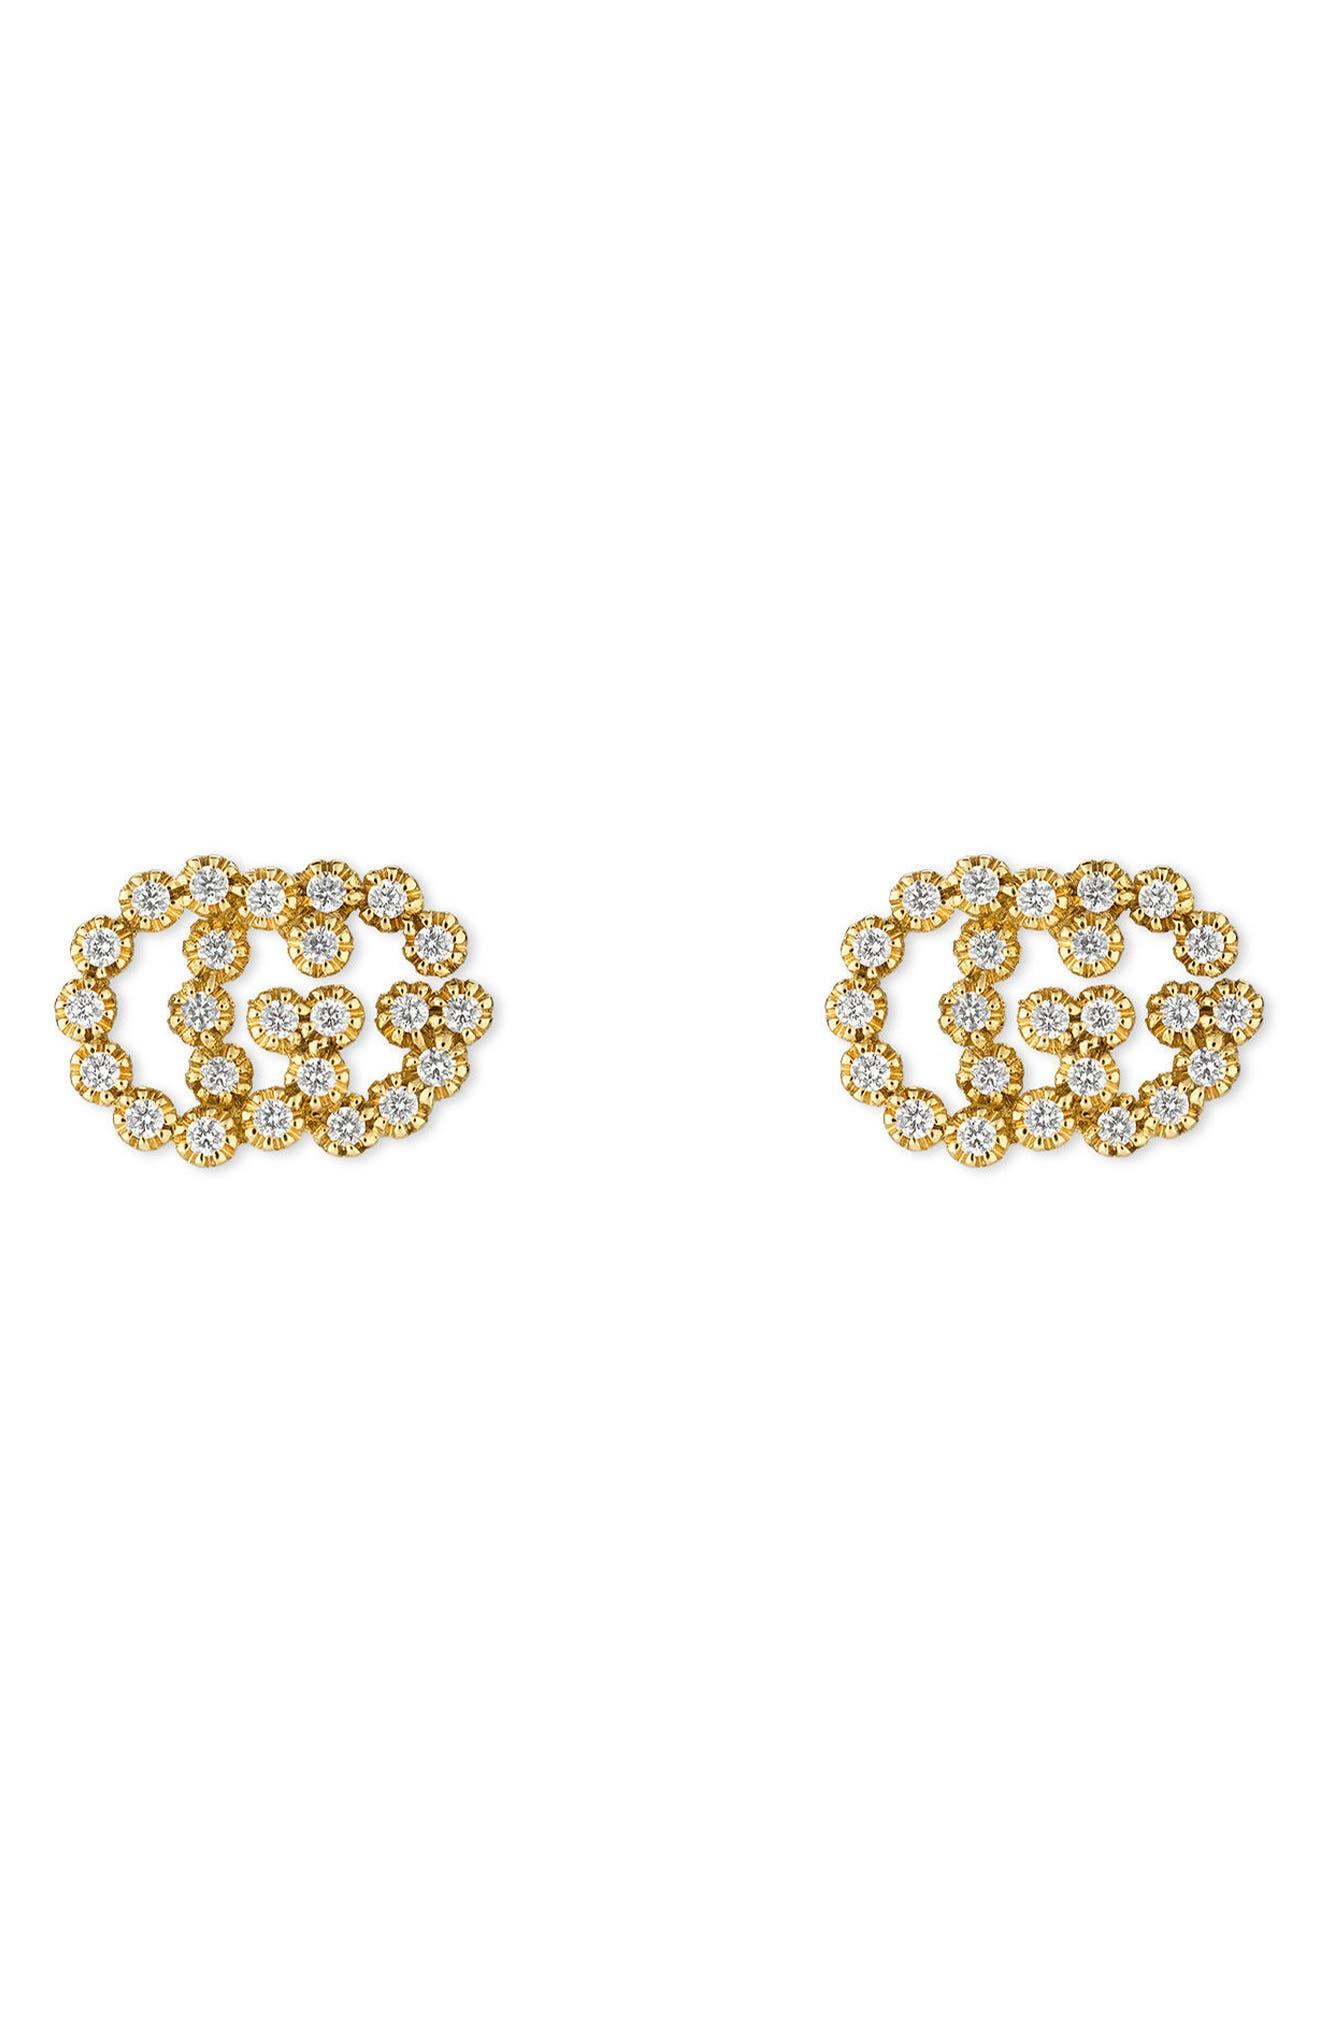 Double-G Diamond Stud Earrings,                             Main thumbnail 1, color,                             YELLOW GOLD